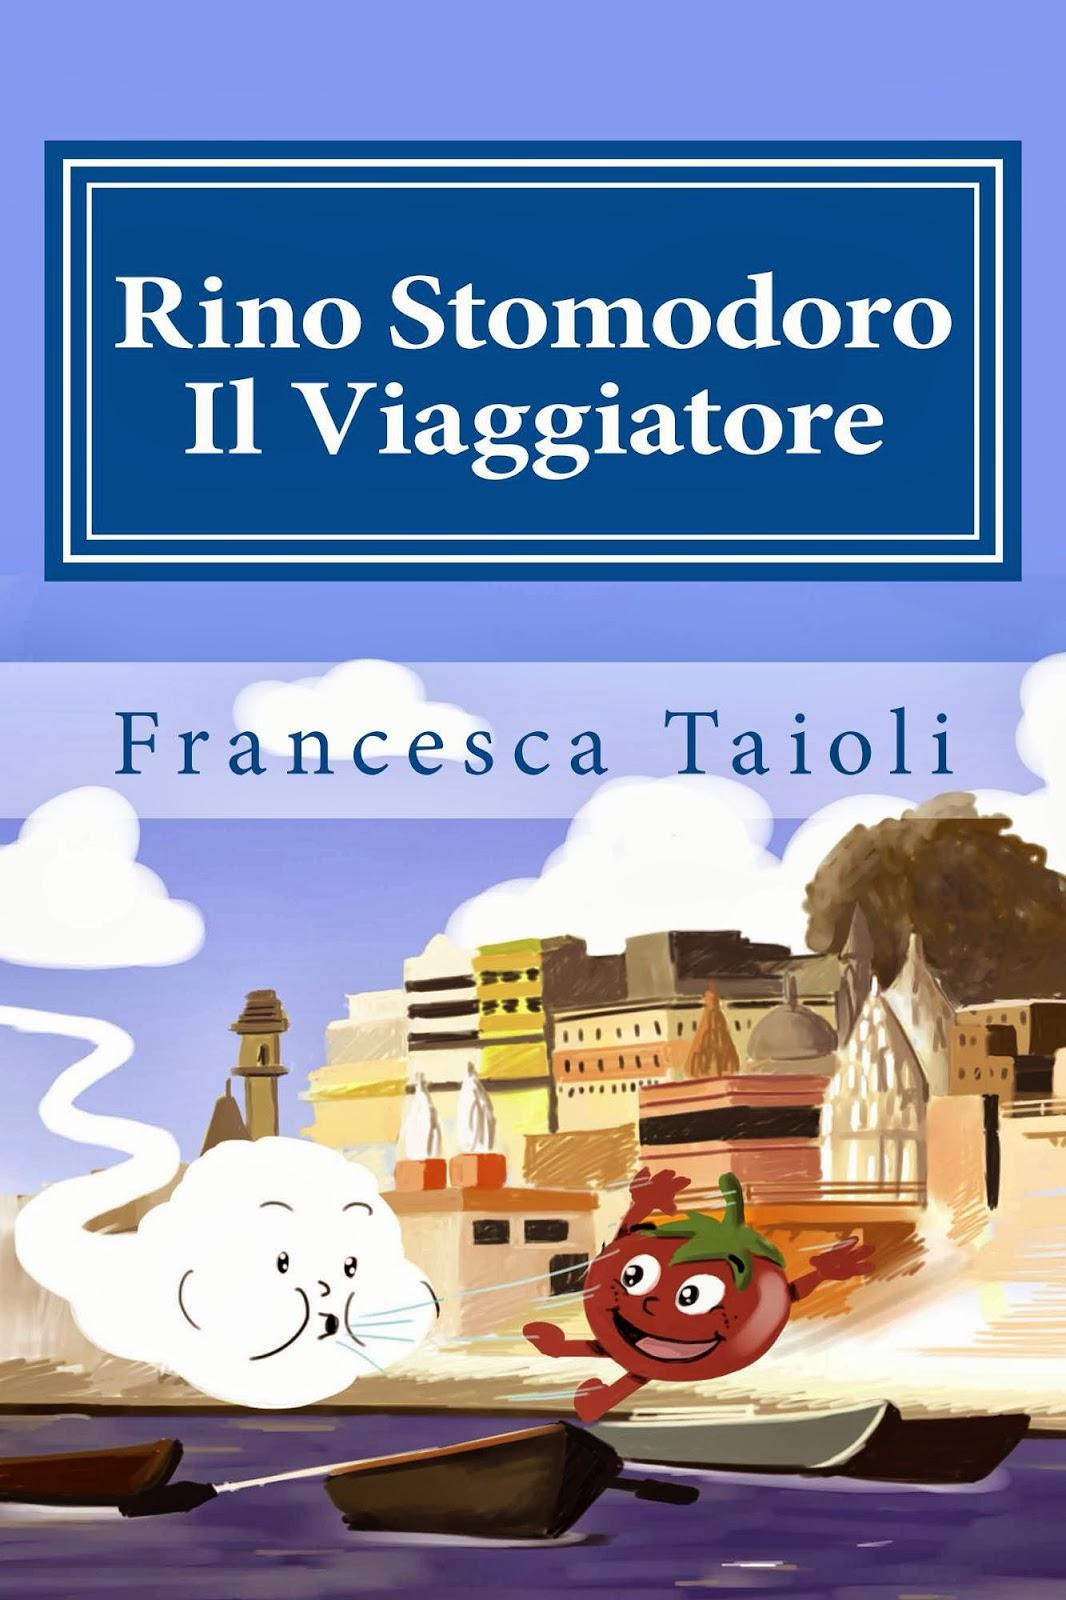 Rino Stomodoro